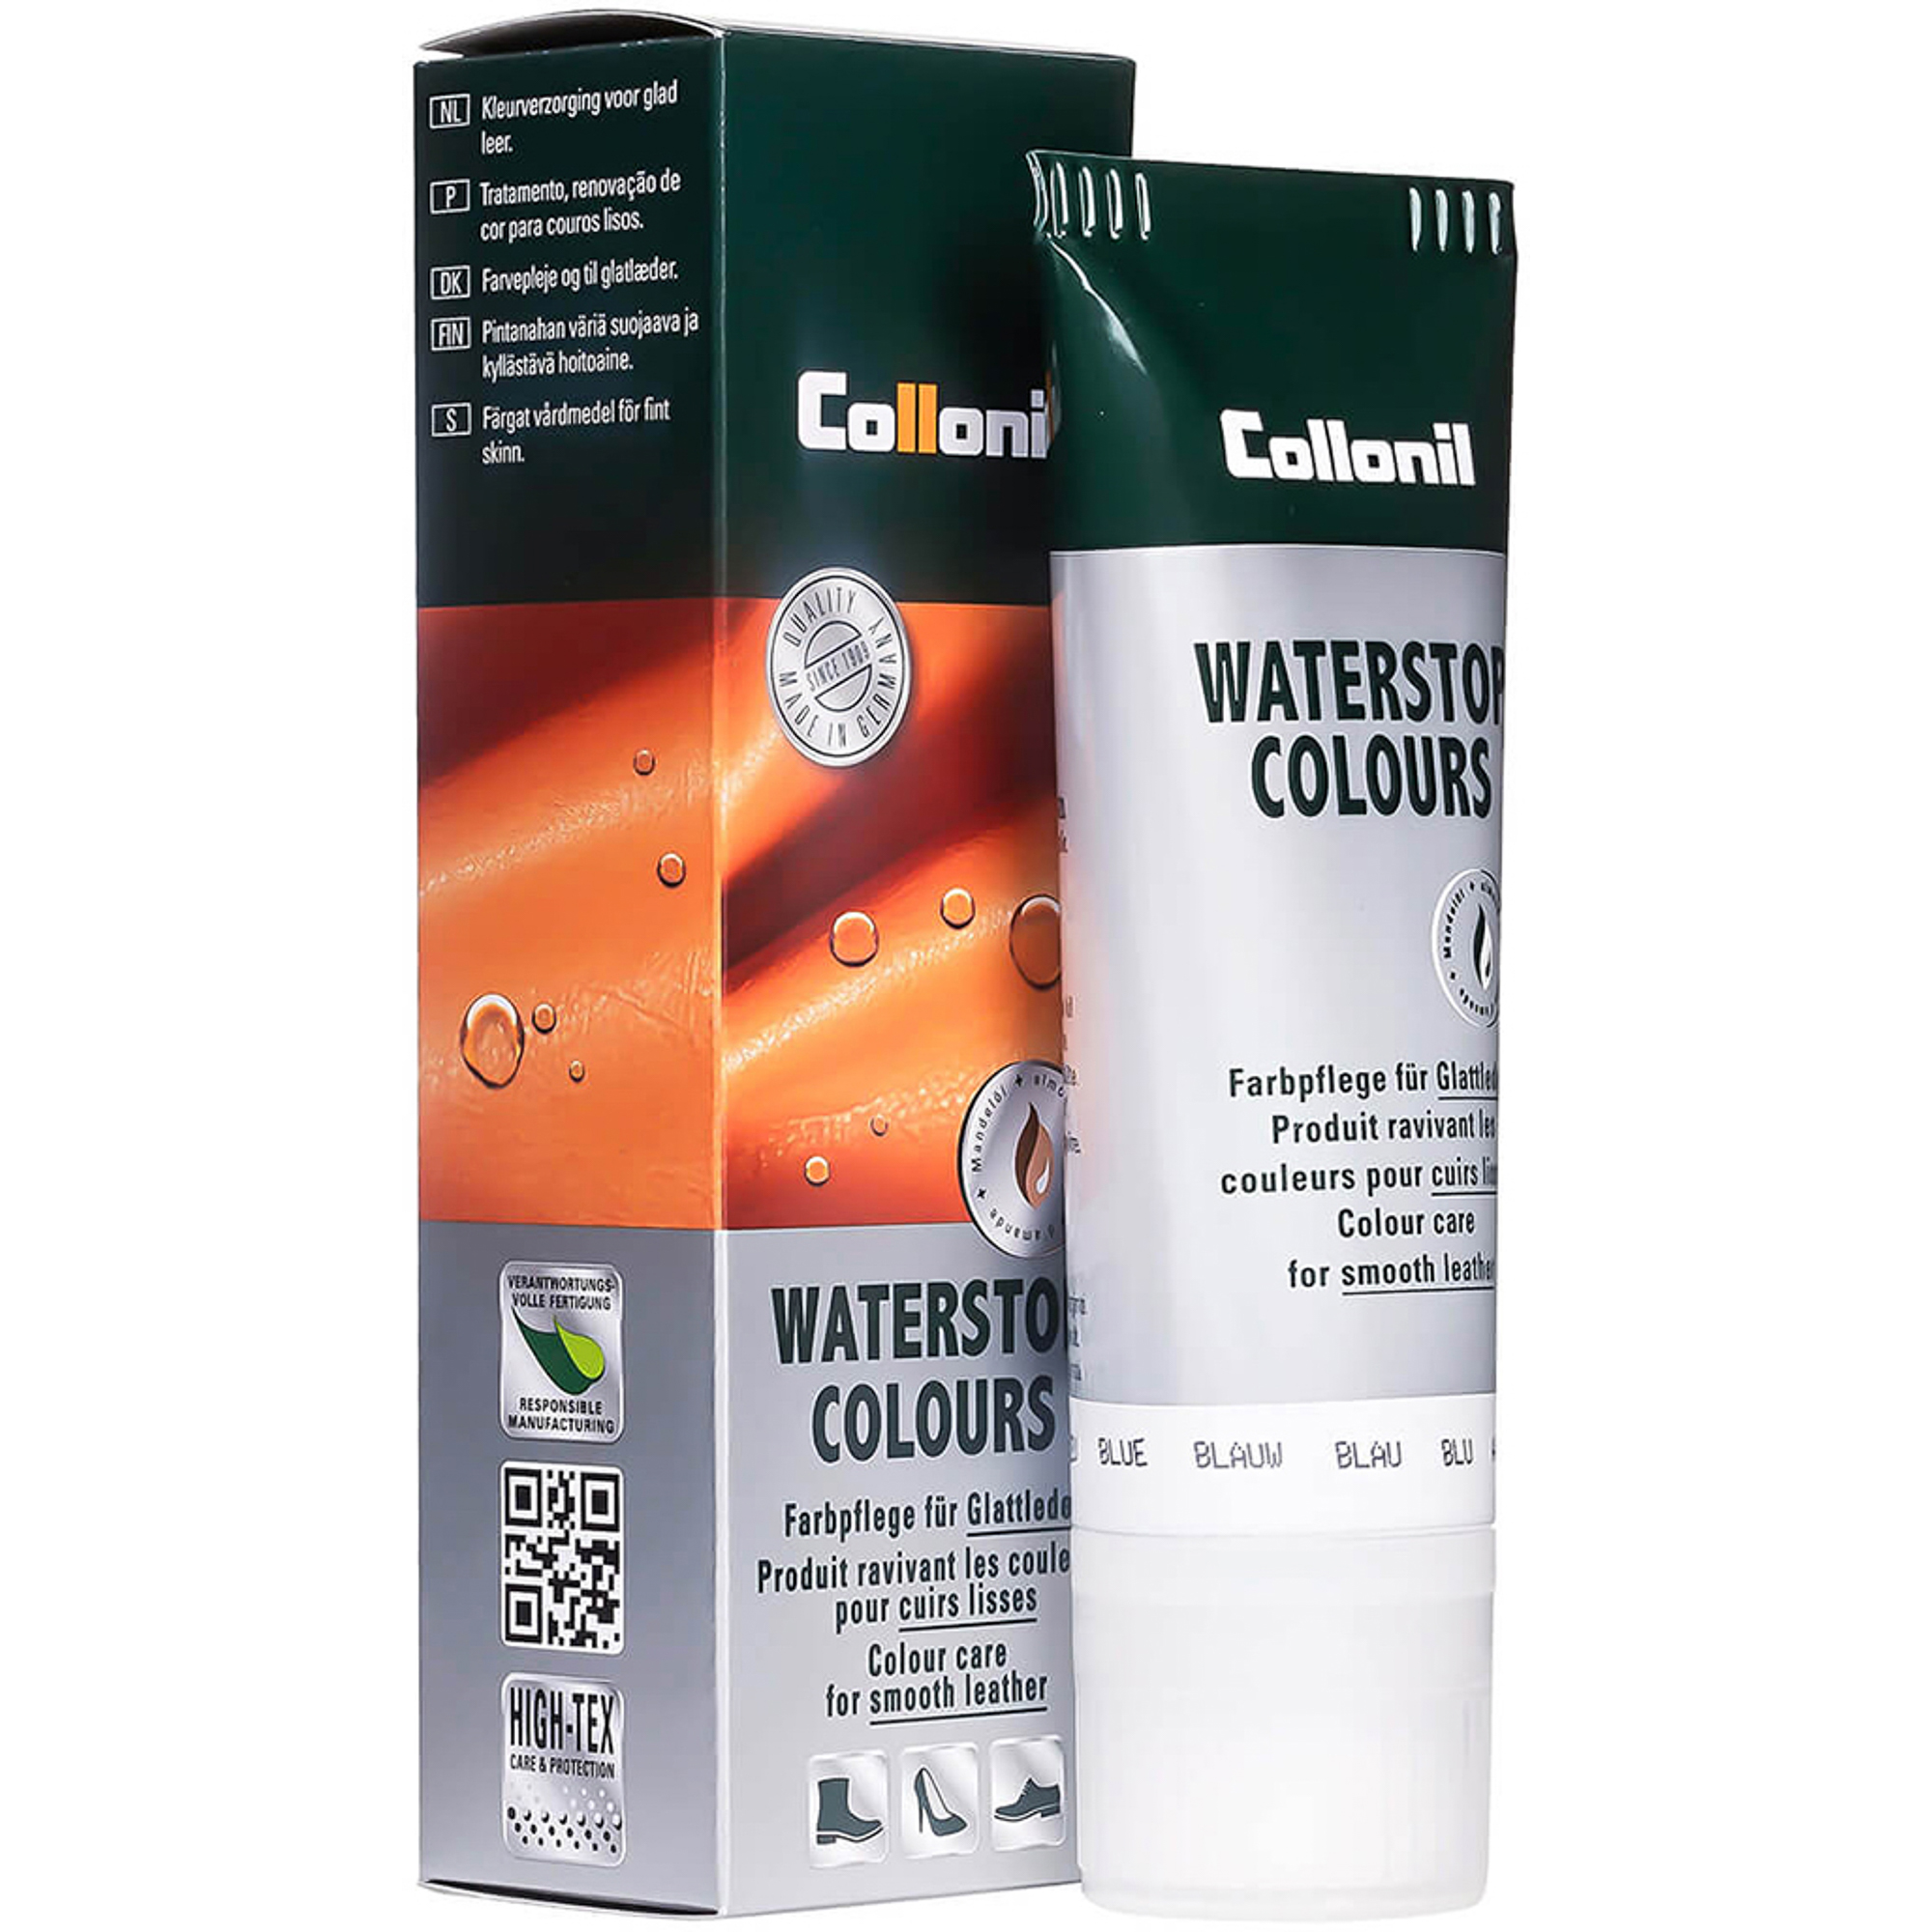 Крем Collonil Waterstop Colours водоотталкивающий синий 75 мл крем collonil colorit tube black